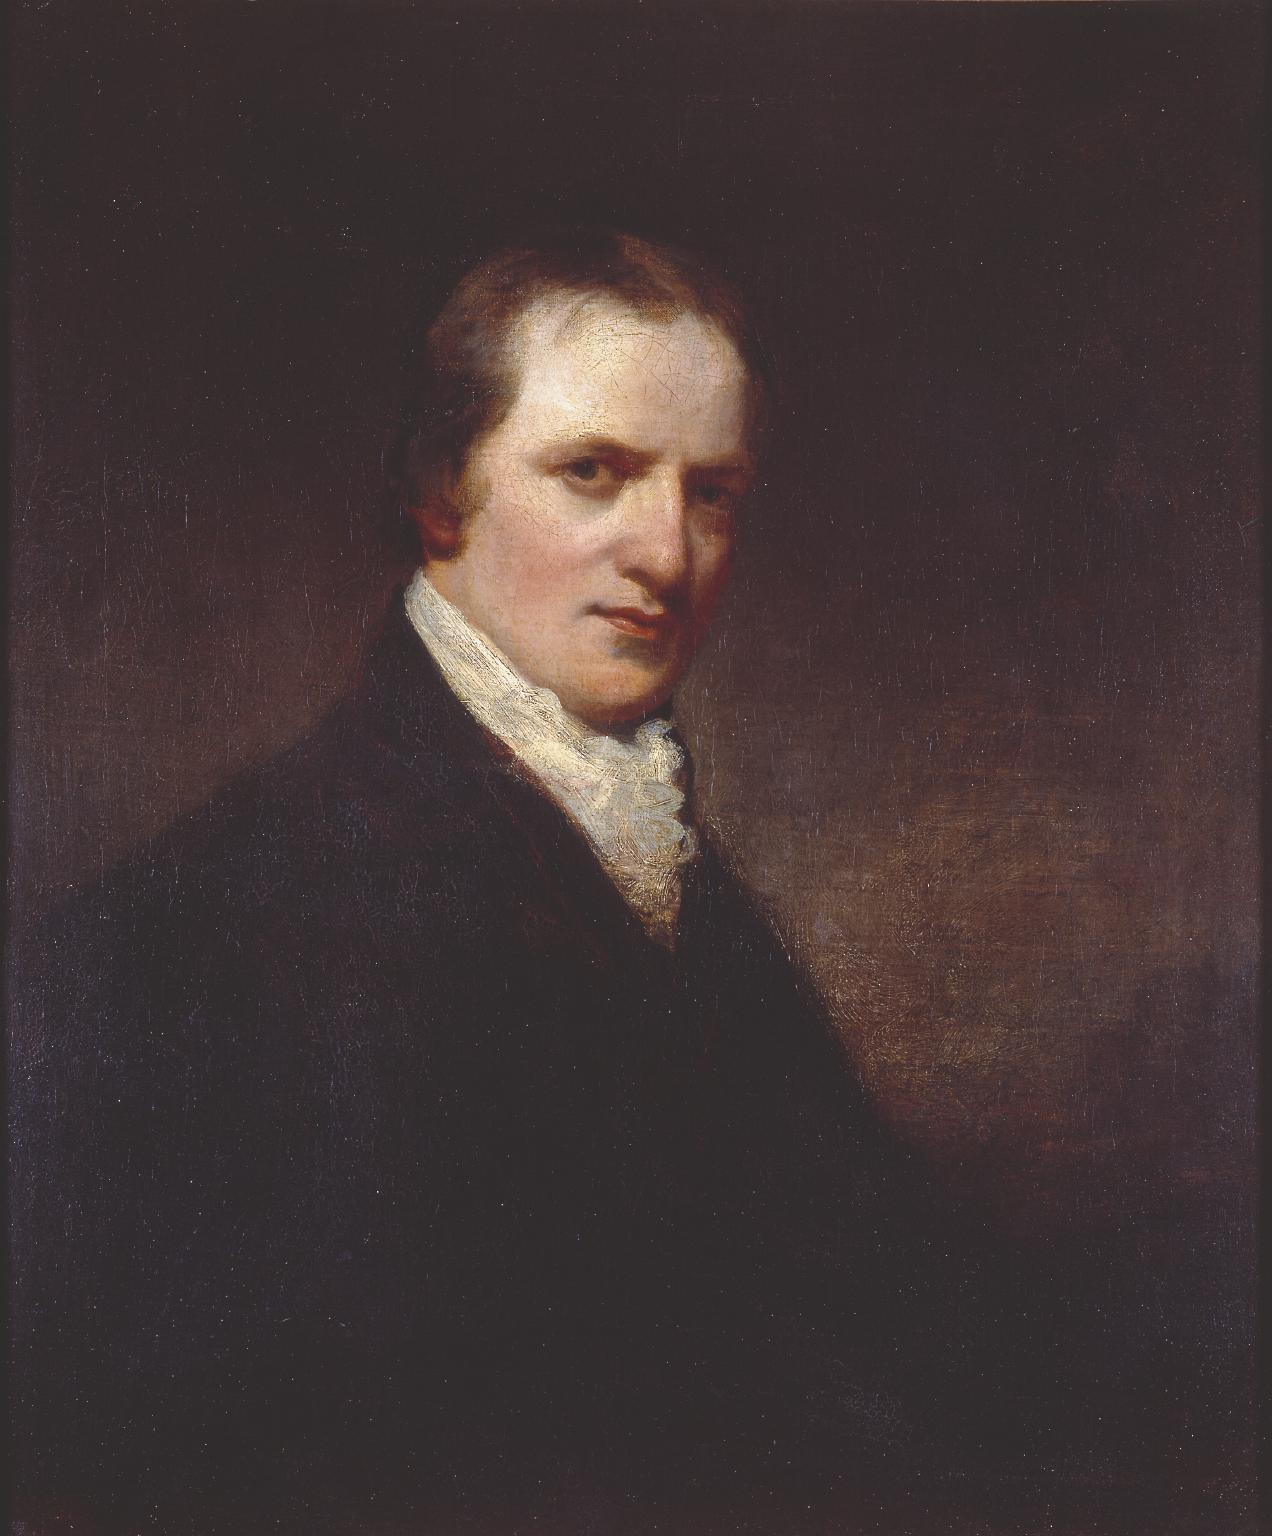 Уильям Годвин (1756-1836)